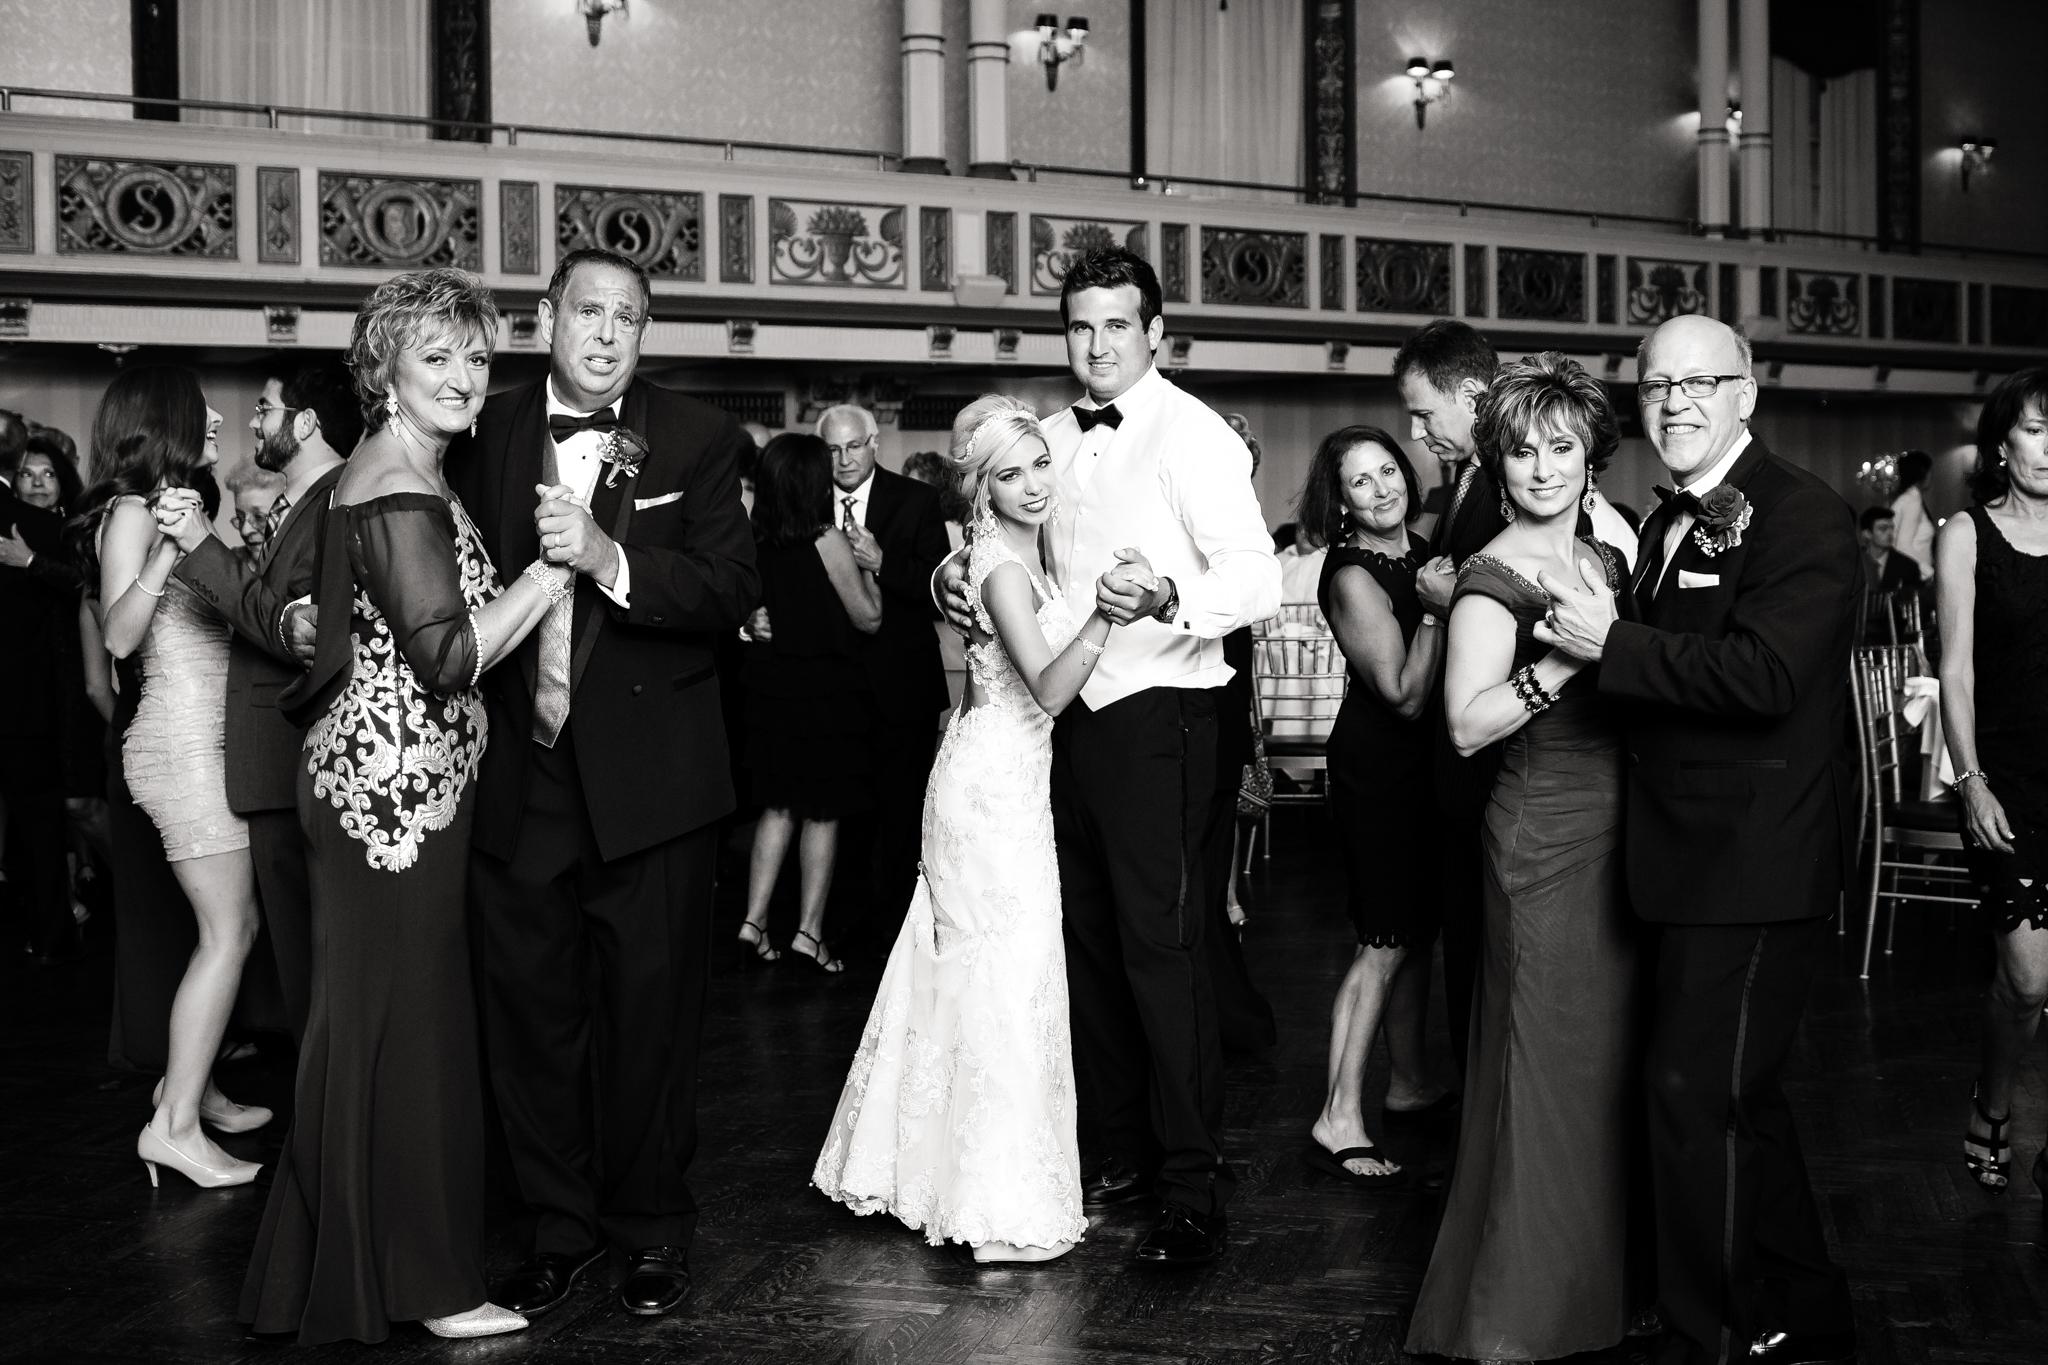 Statler-City-Buffalo-wedding-photographer- 0640bw.jpg